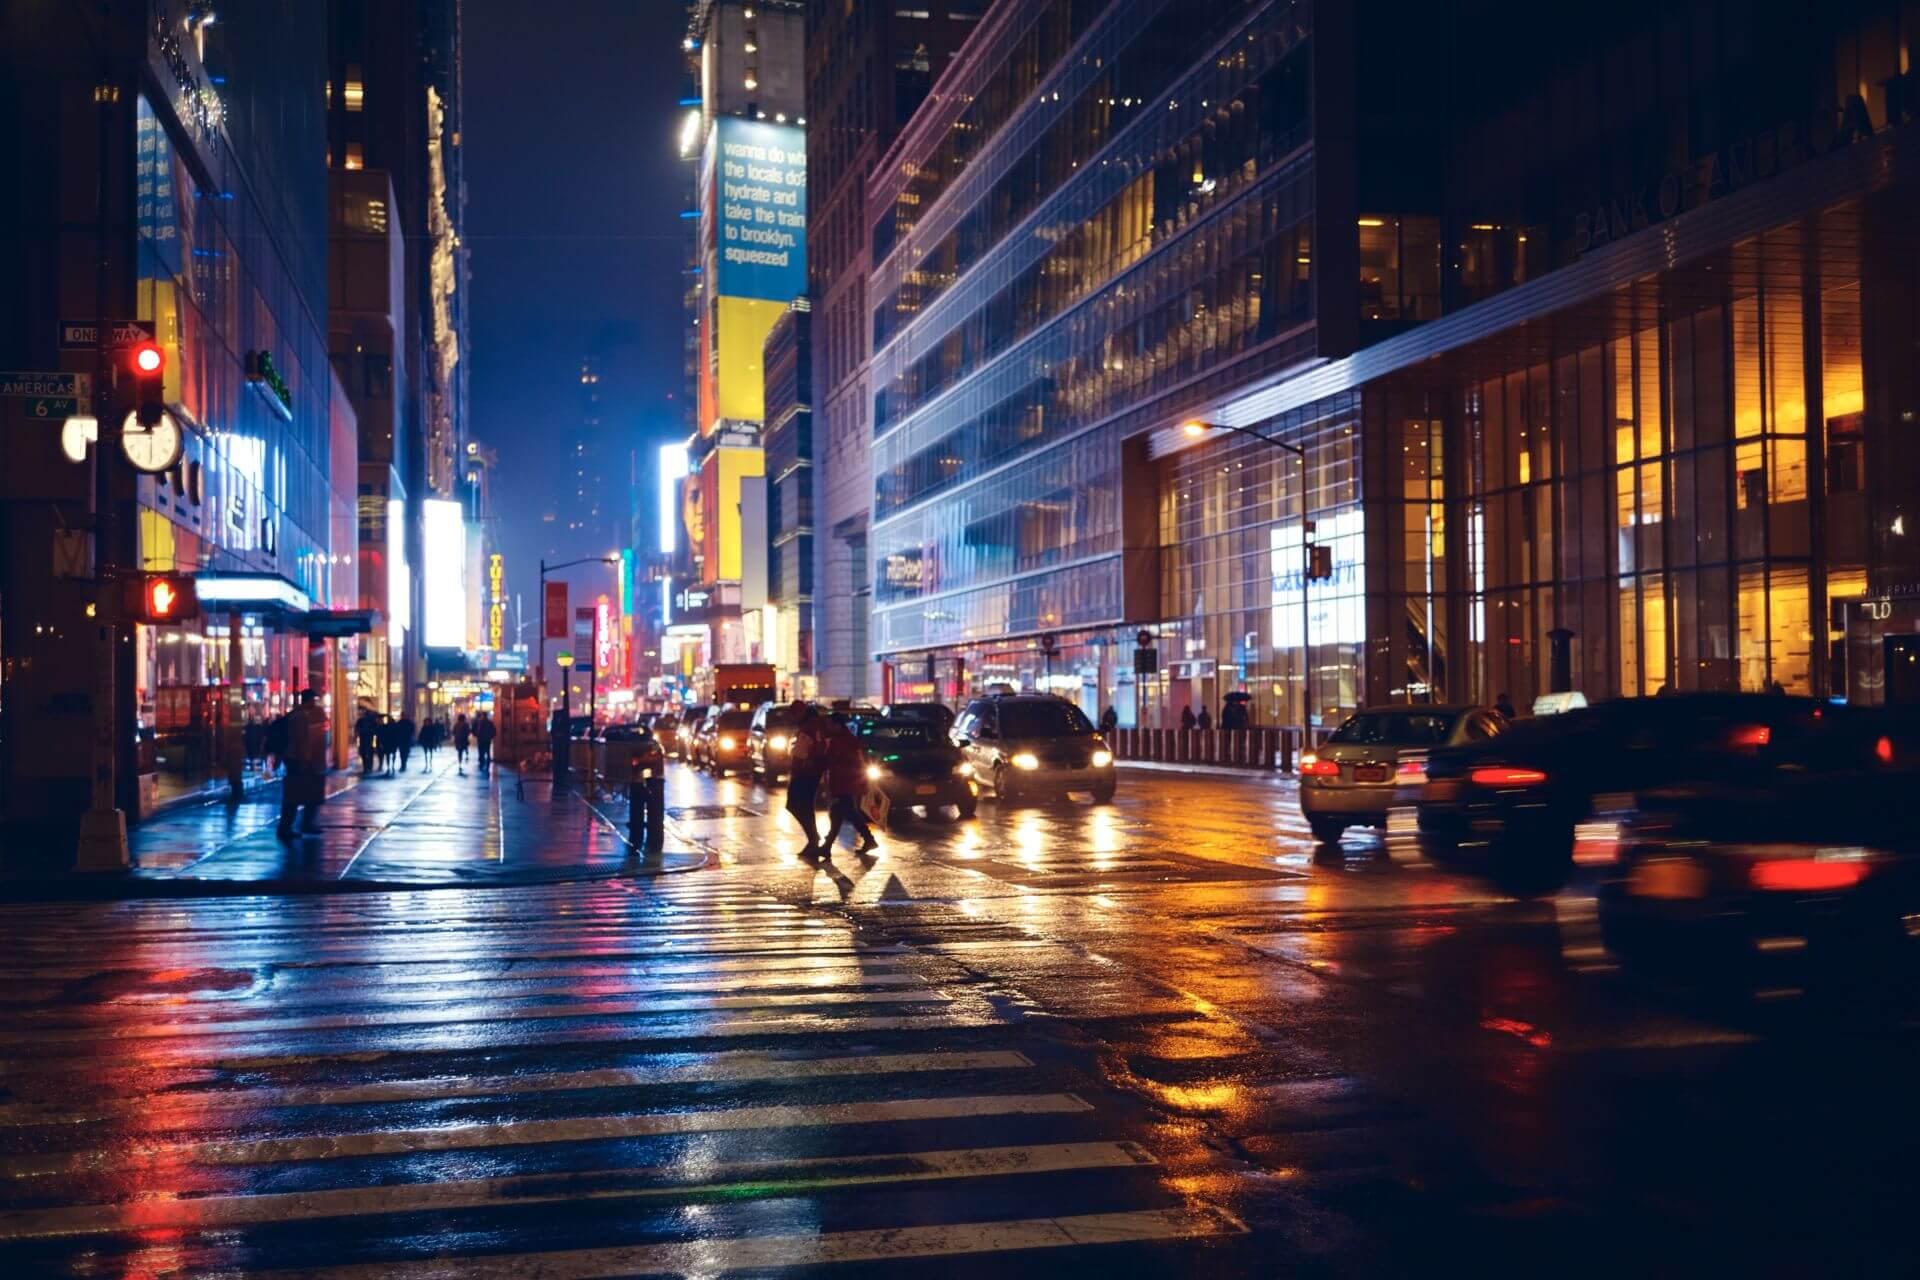 https://sleeklens.com/wp-content/uploads/2020/01/New-York-by-Night-Before.jpg